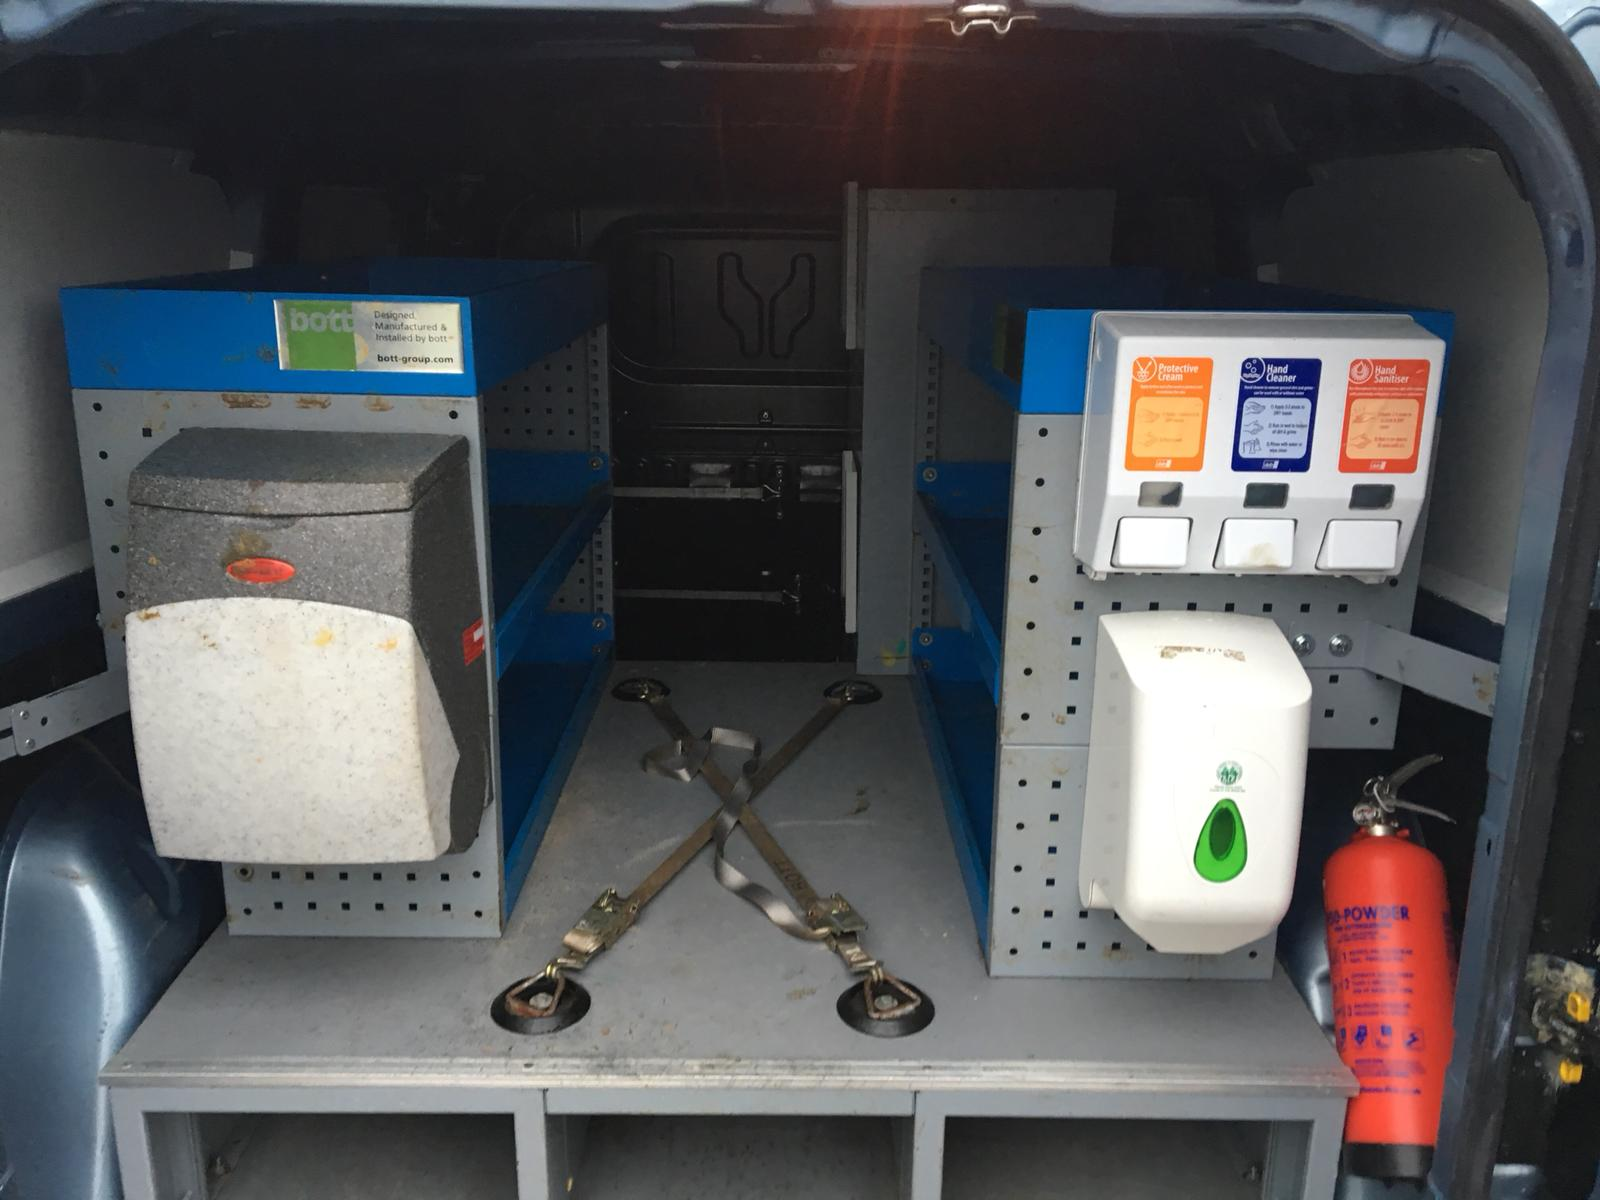 Lot 52 - 2012/12 REG VAUXHALL COMBO 2300 L2H1 CDTI BLUE DIESEL PANEL VAN, SHOWING 0 FORMER KEEPERS *NO VAT*